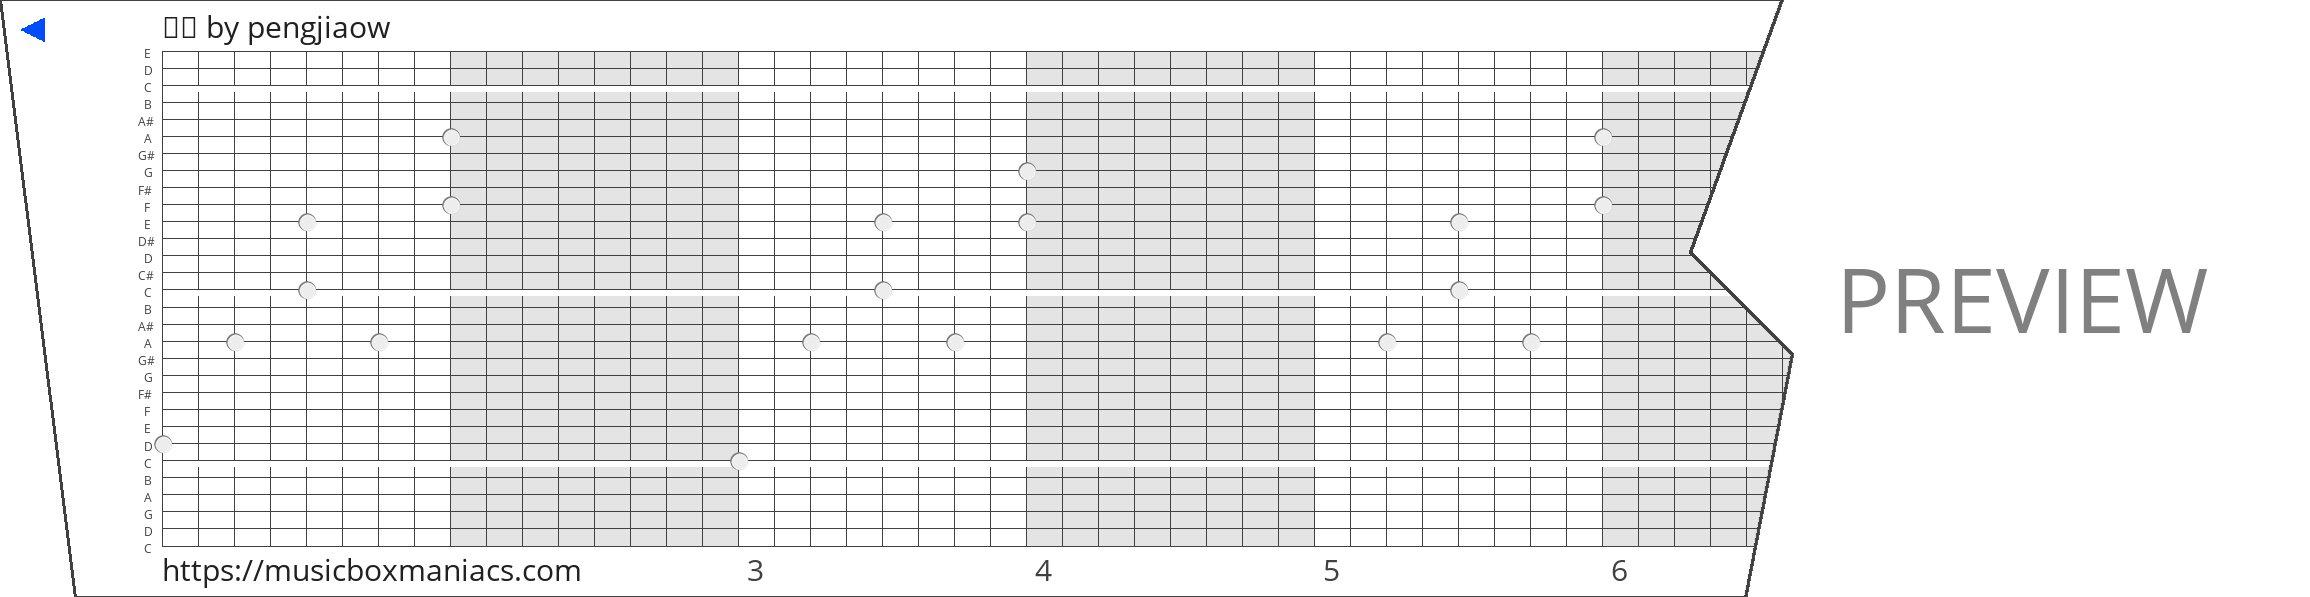 偶然 30 note music box paper strip